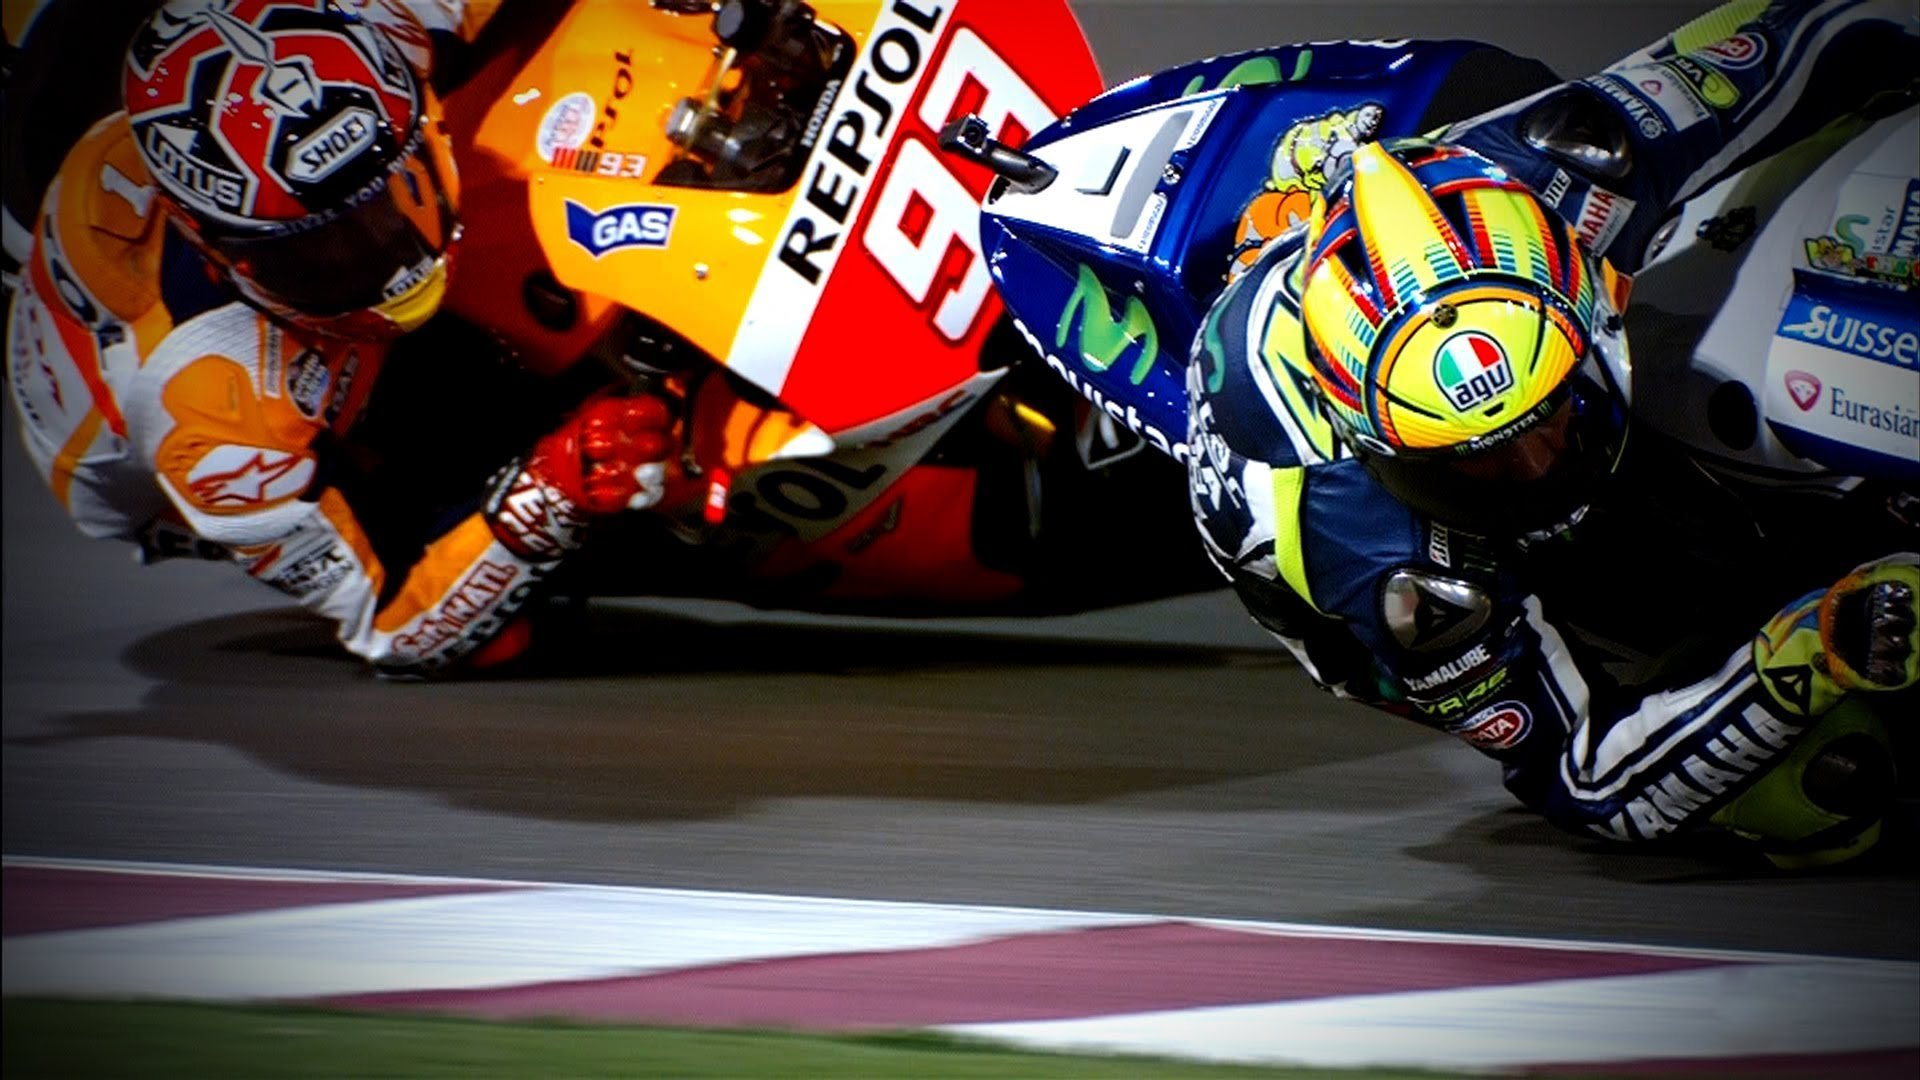 MOTOGP Championship Grand Prix superbike race racing moto le mans 3 1920x1080